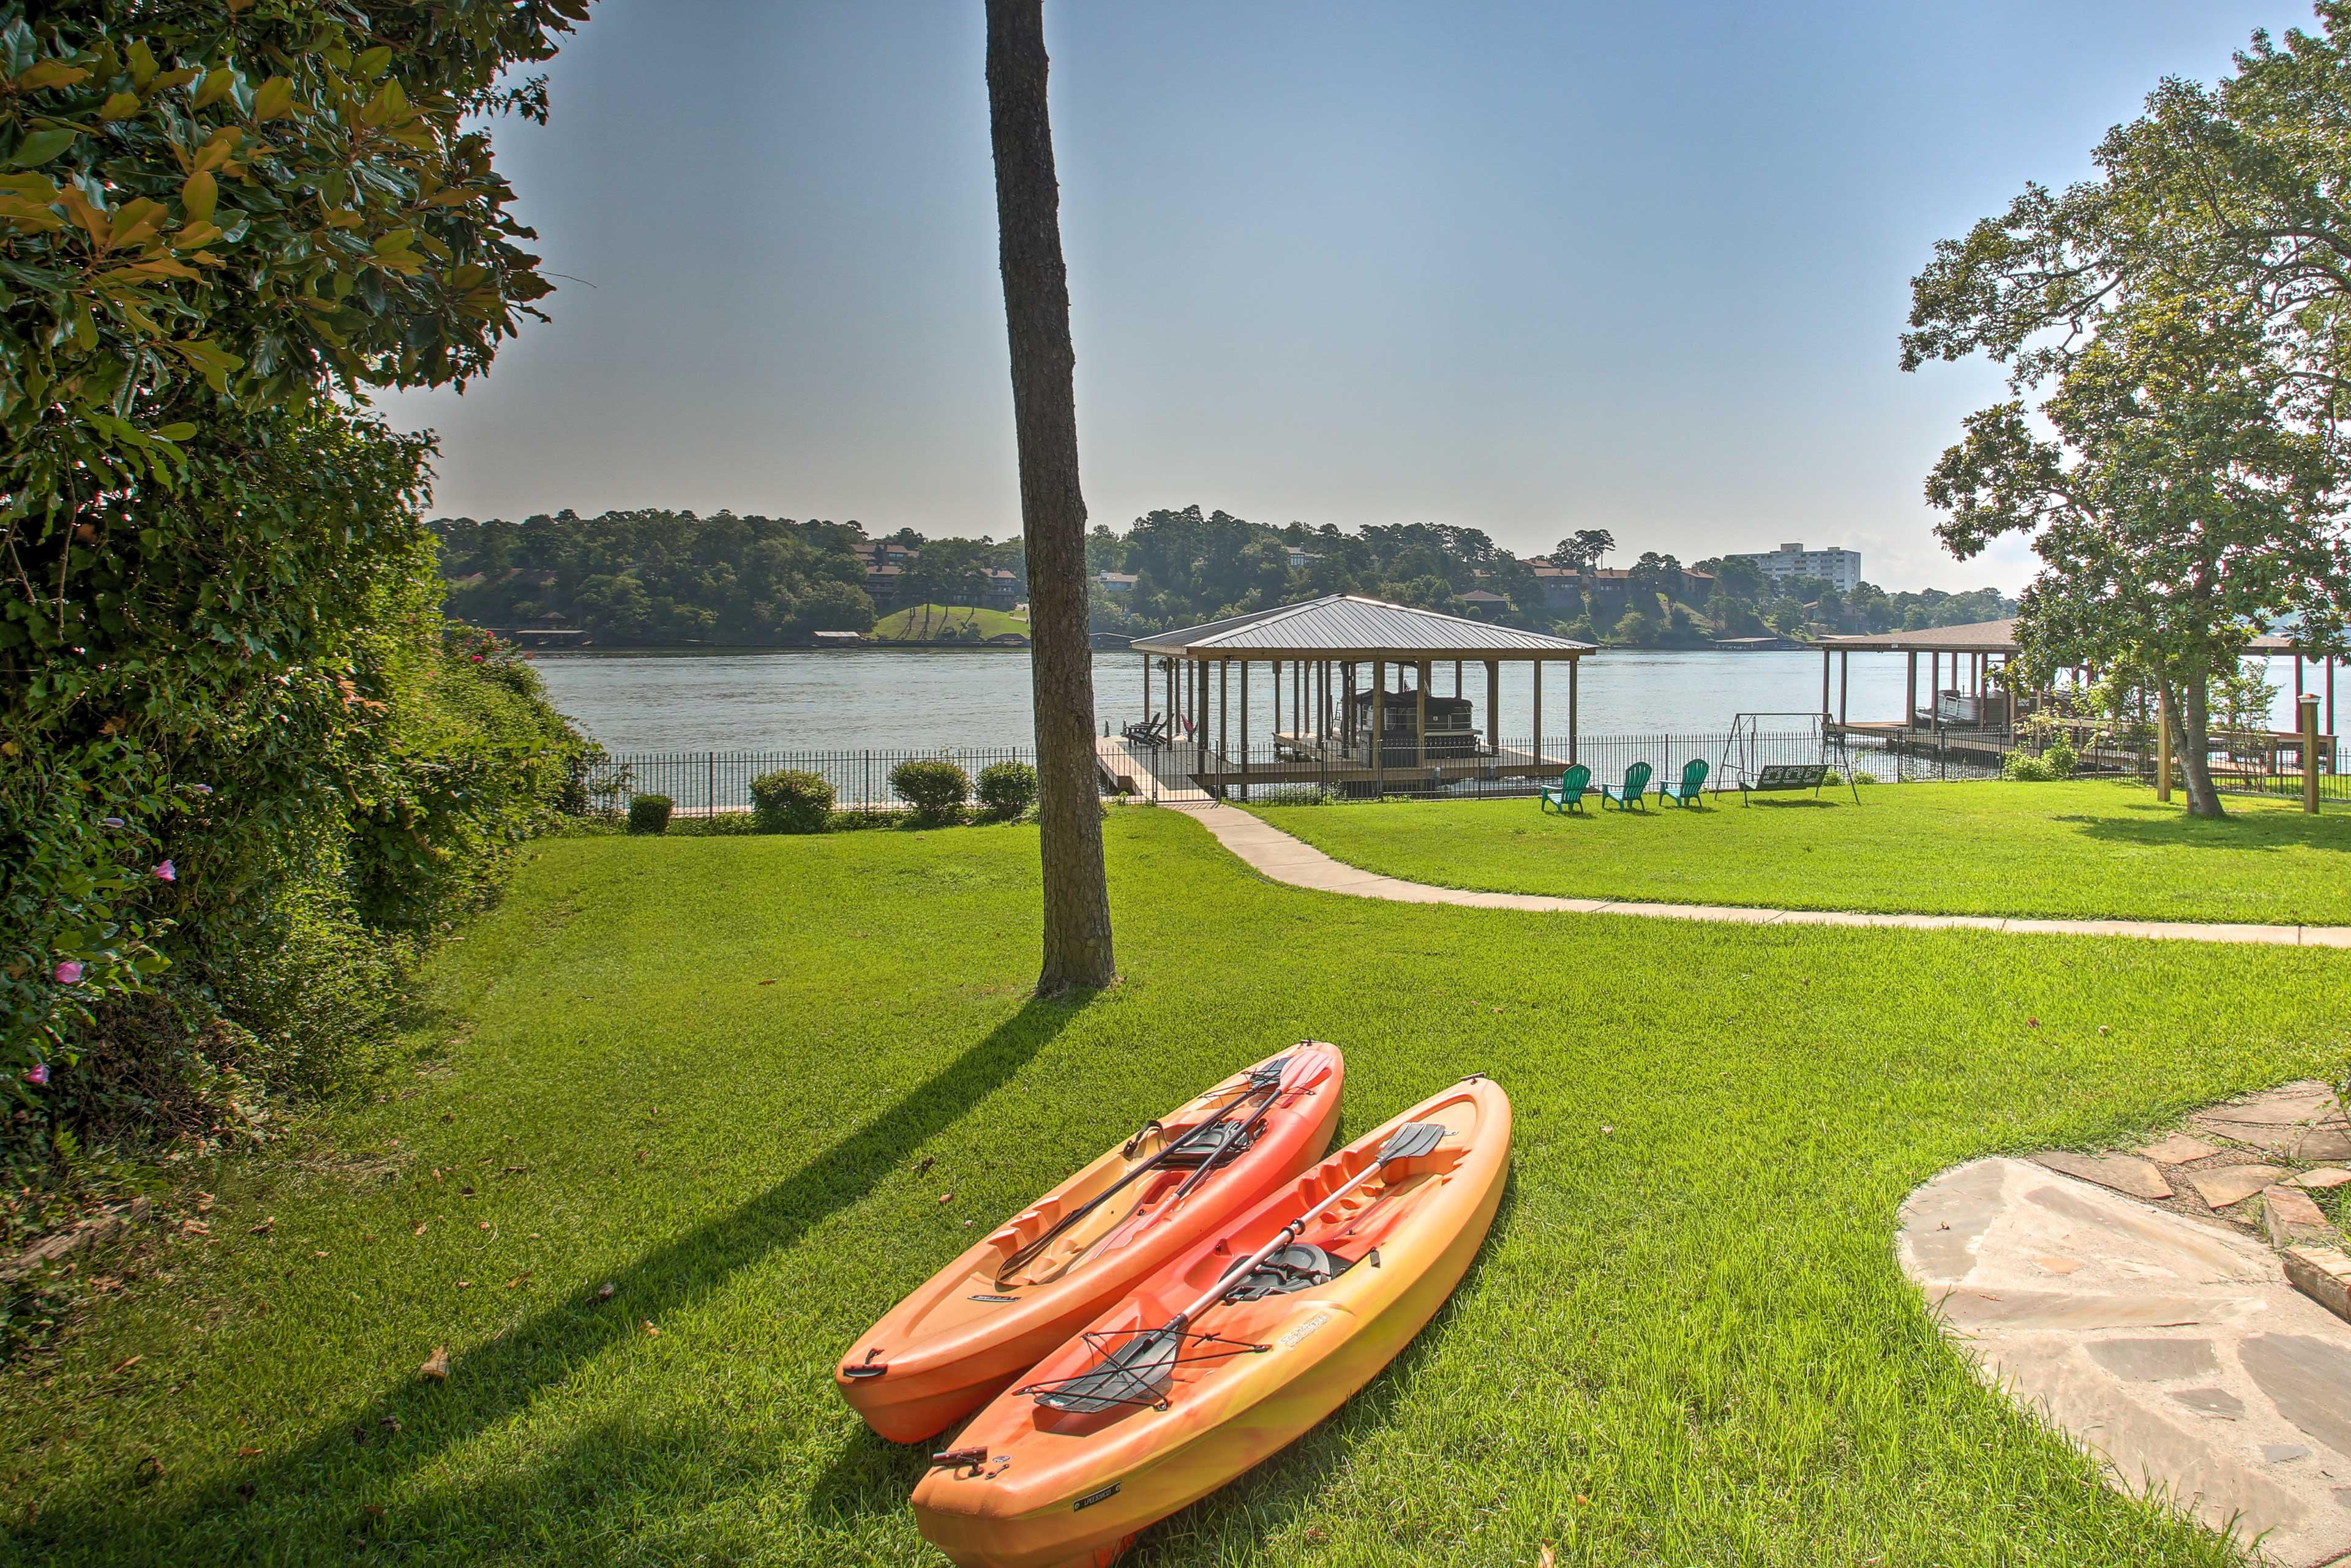 Hot Springs Vacation Rental | 2BR | 2BA | 1,857 Sq Ft | Step-Free Access